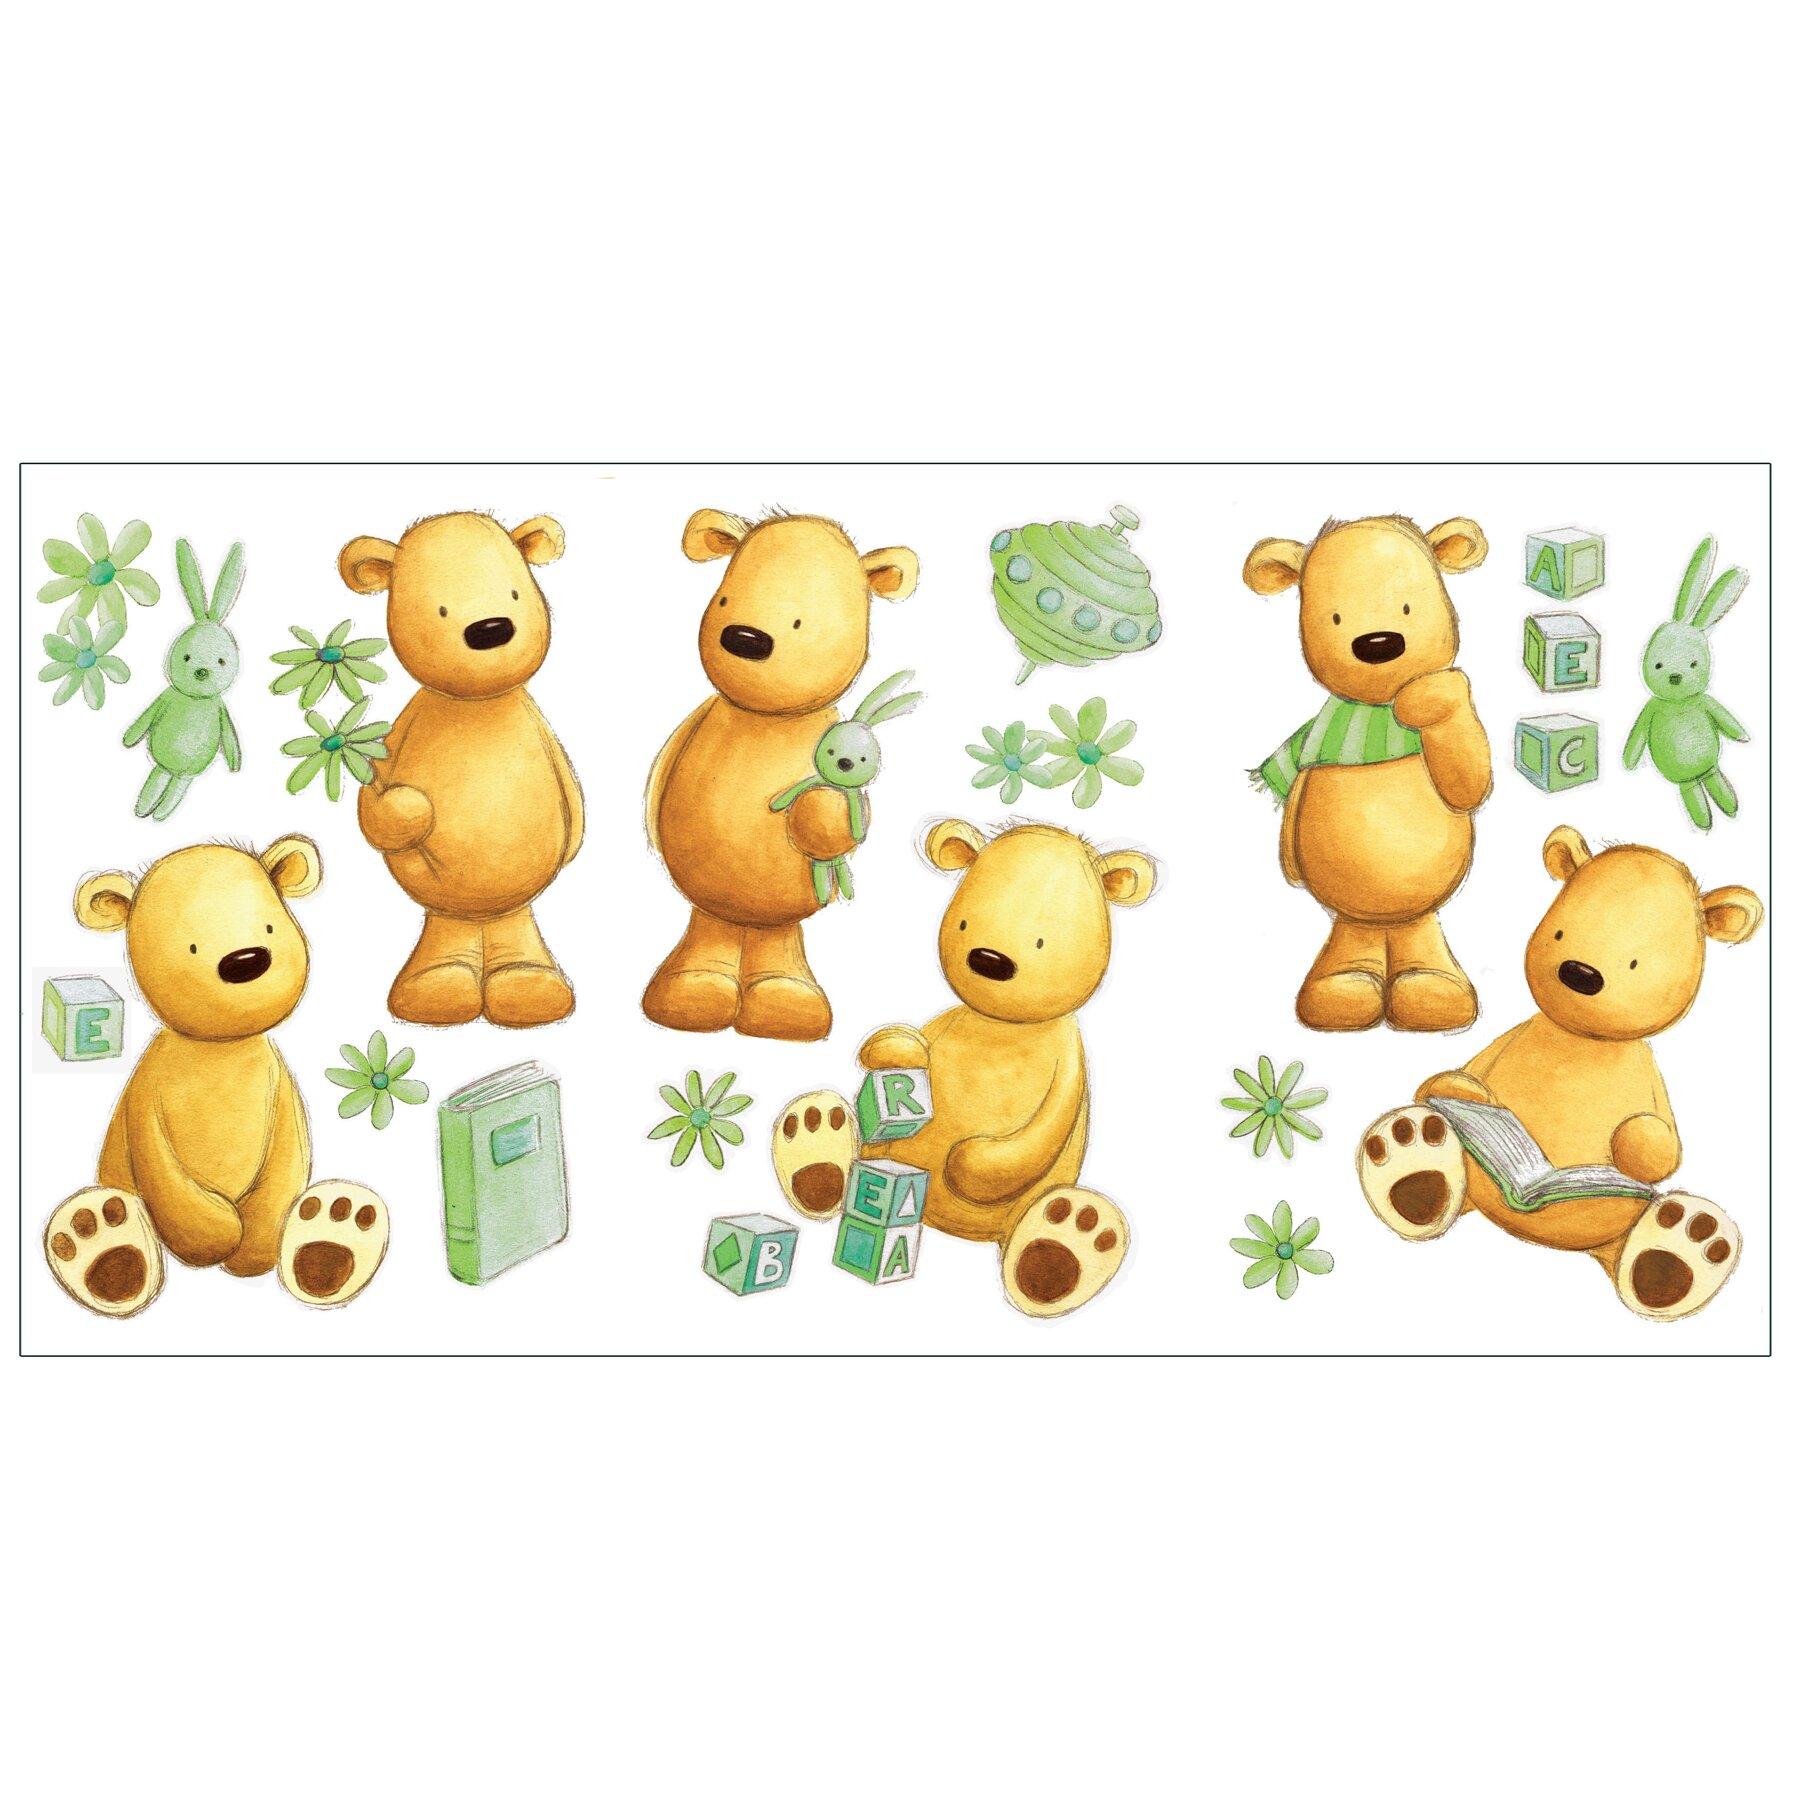 fun4walls teddy bear wall decal wayfair bear reading corner wall stickers